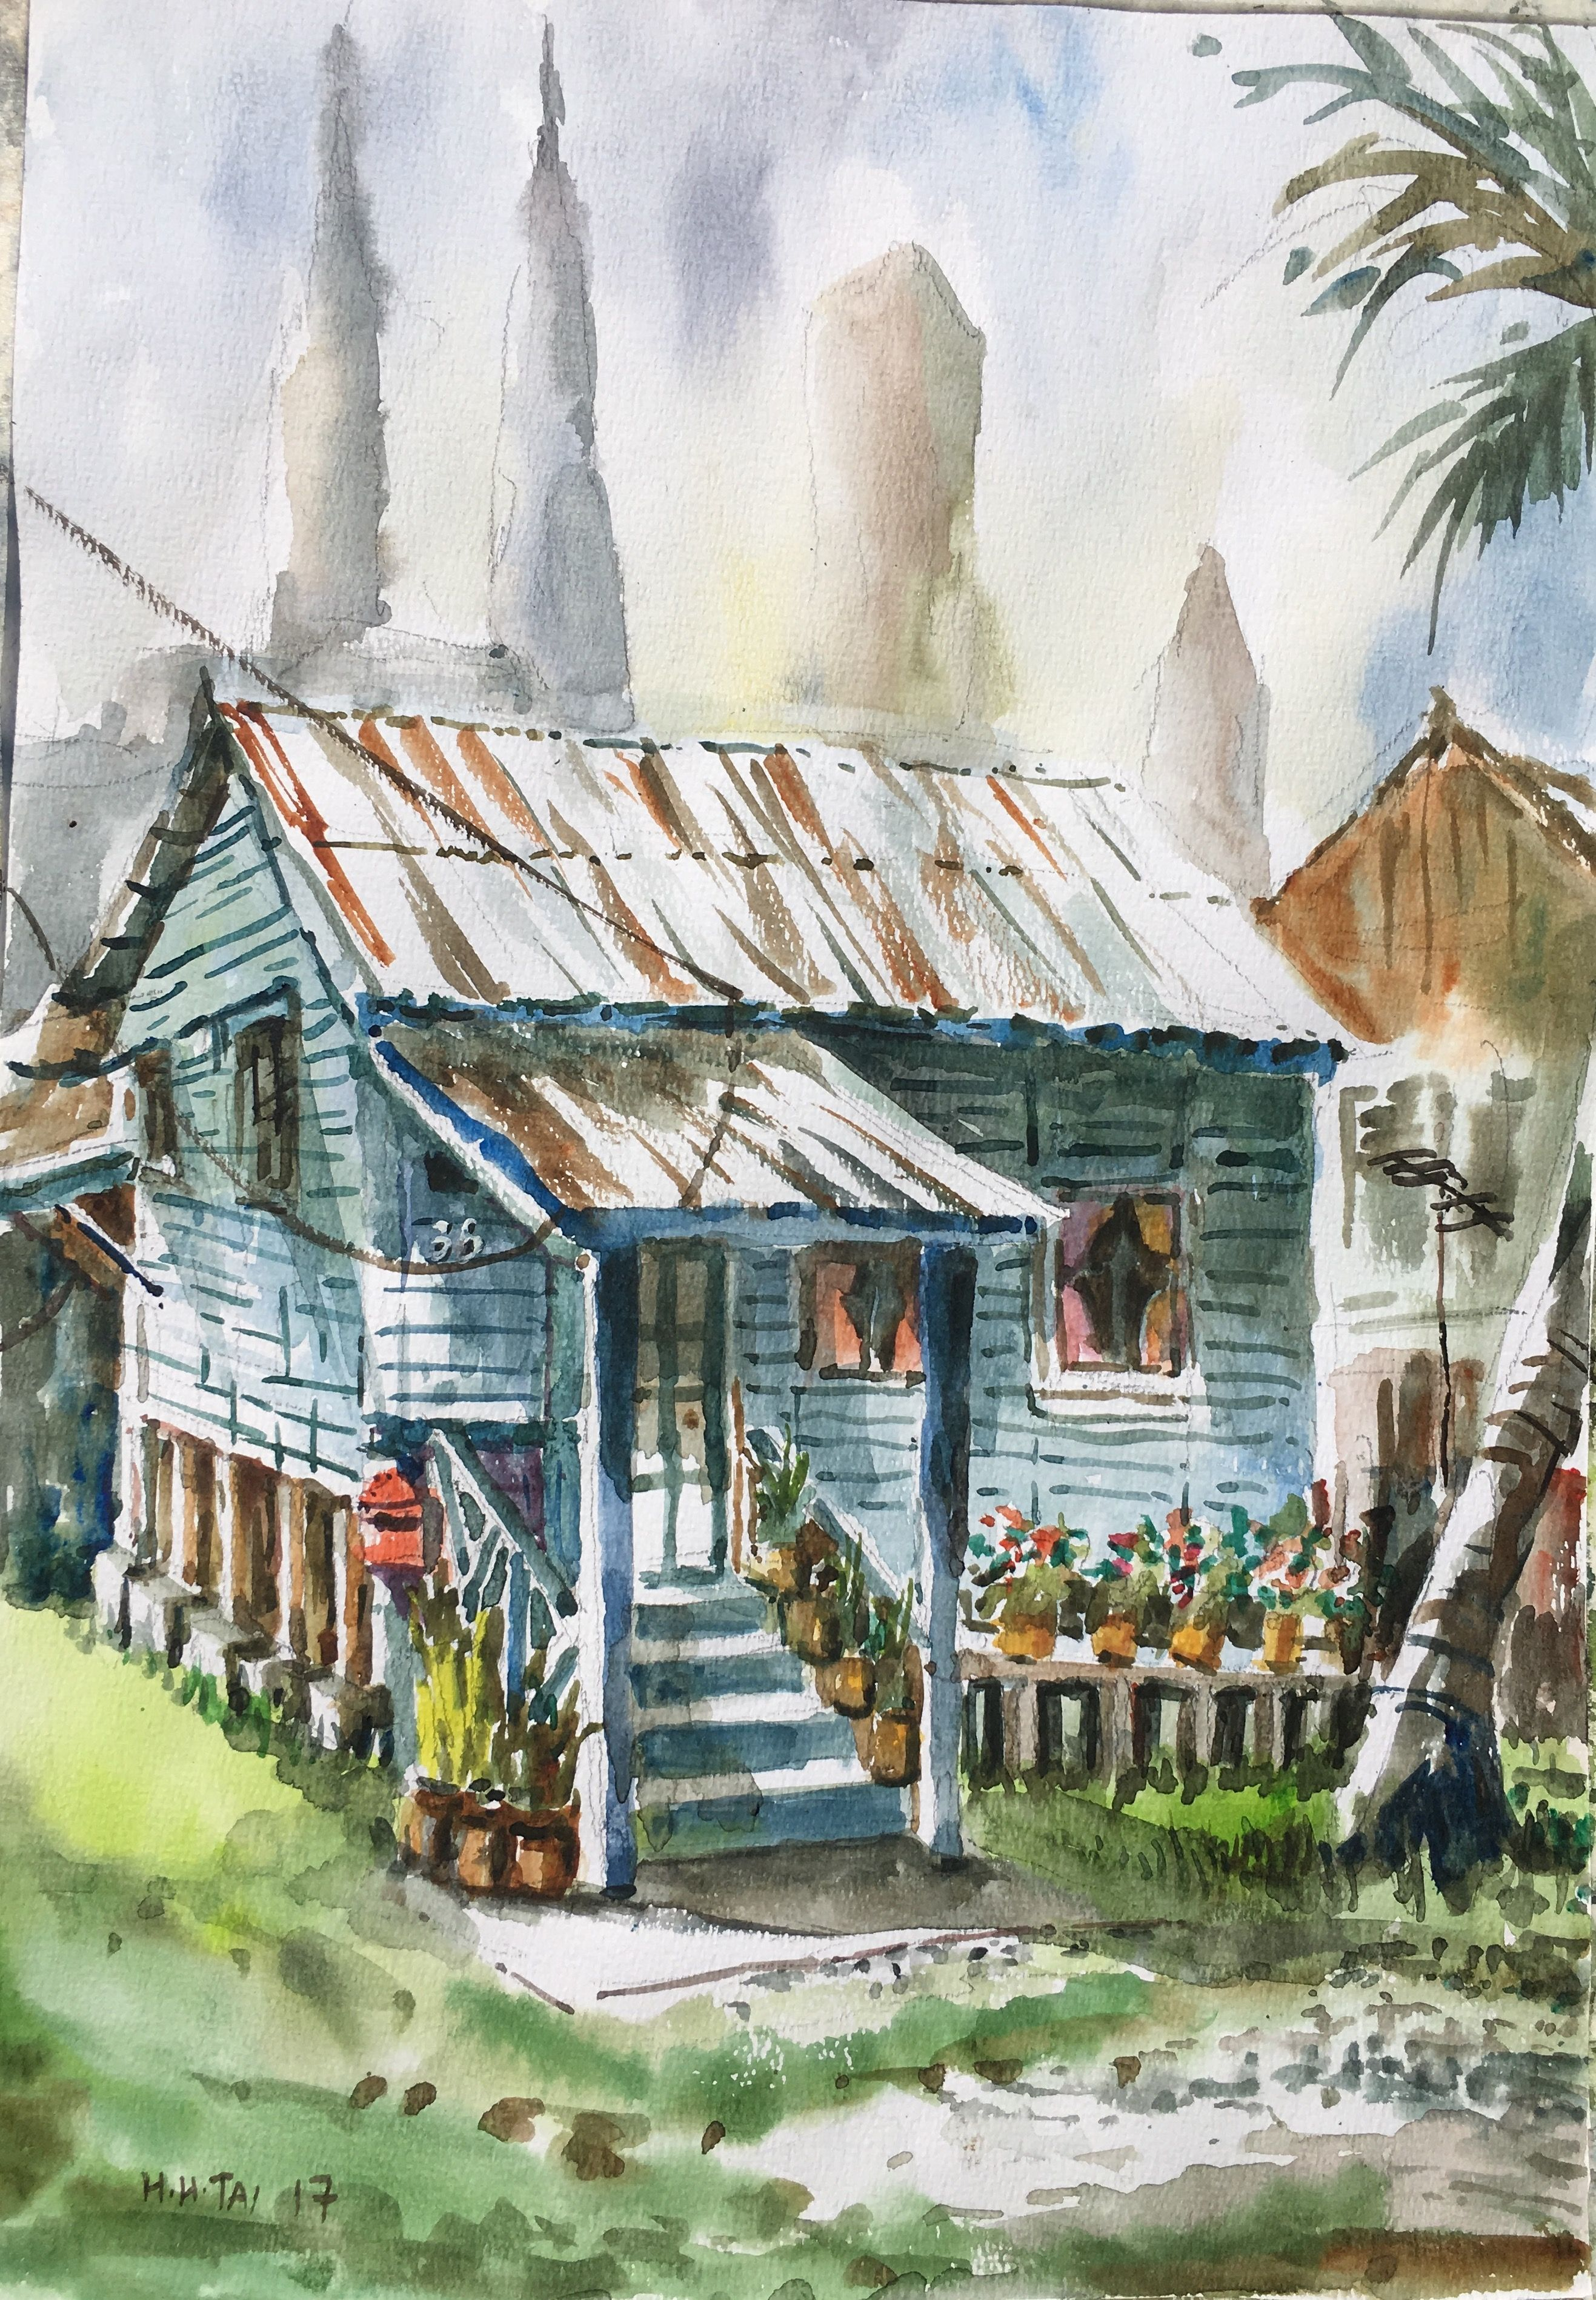 Rumah Biru Kampung Baru Watercolour By Brian Tai Kampung Baru